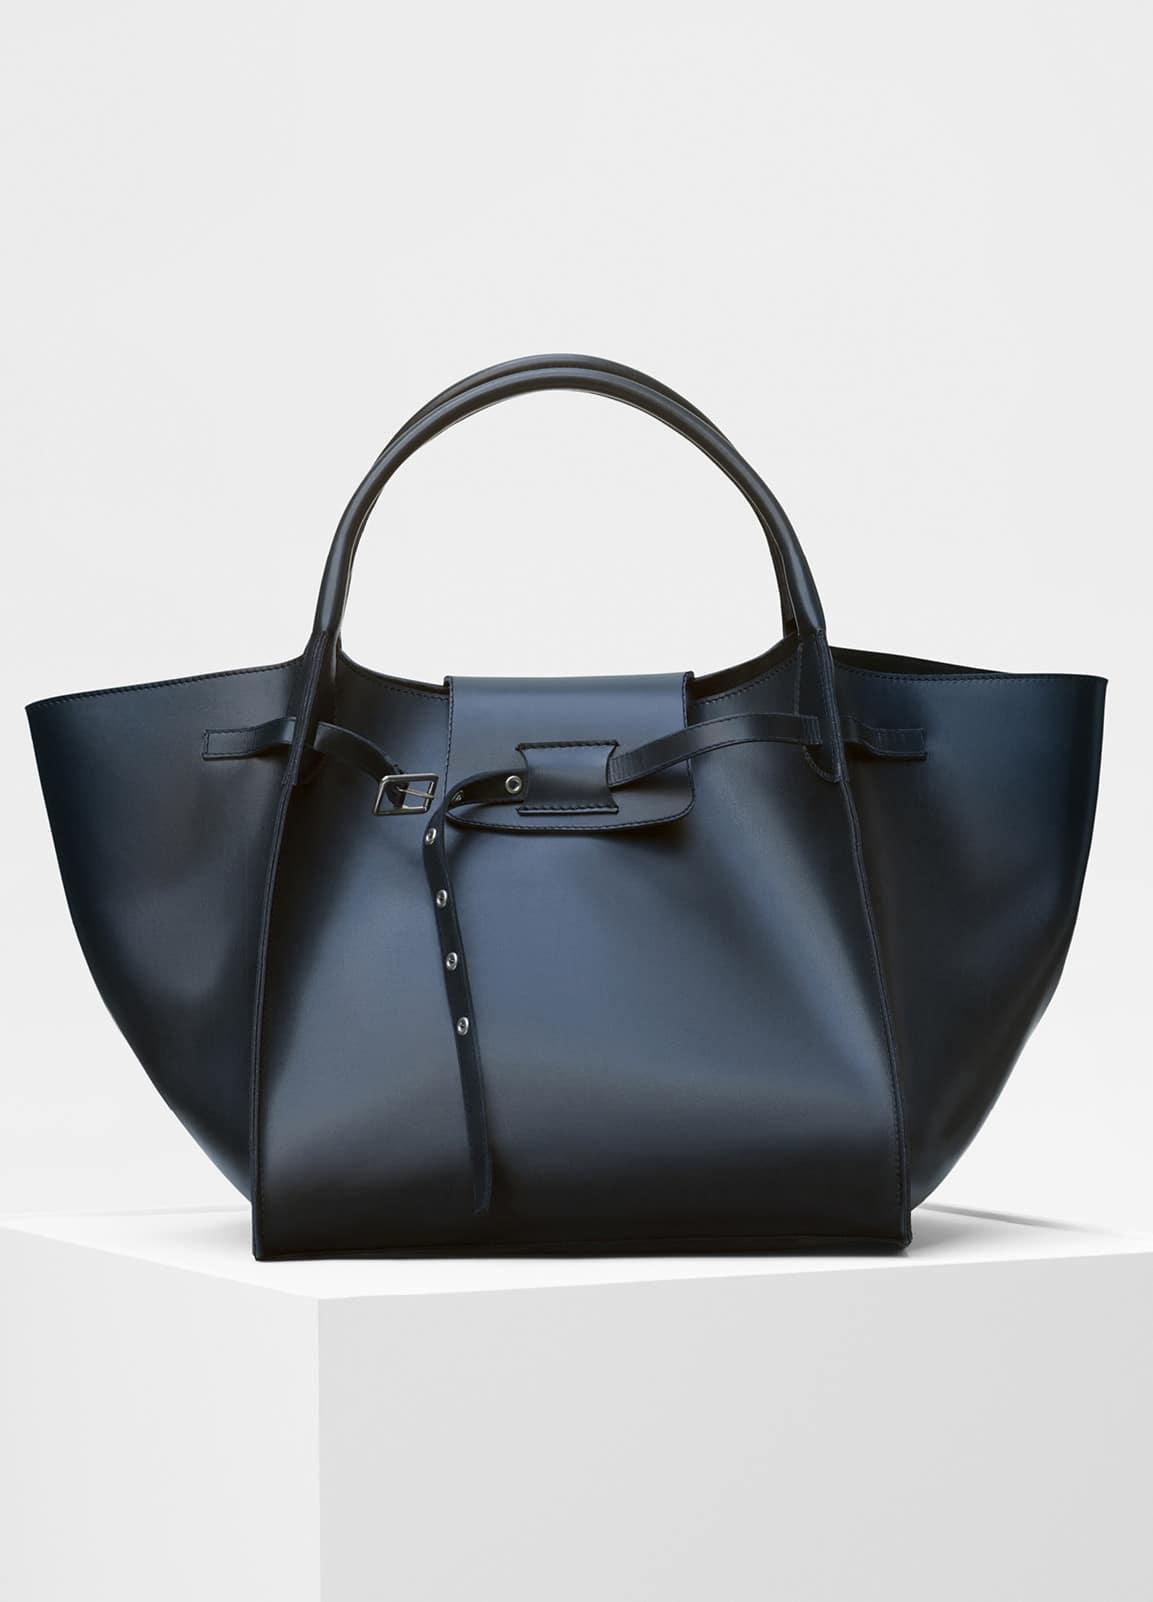 celine handbags price 2013 handbags 2018